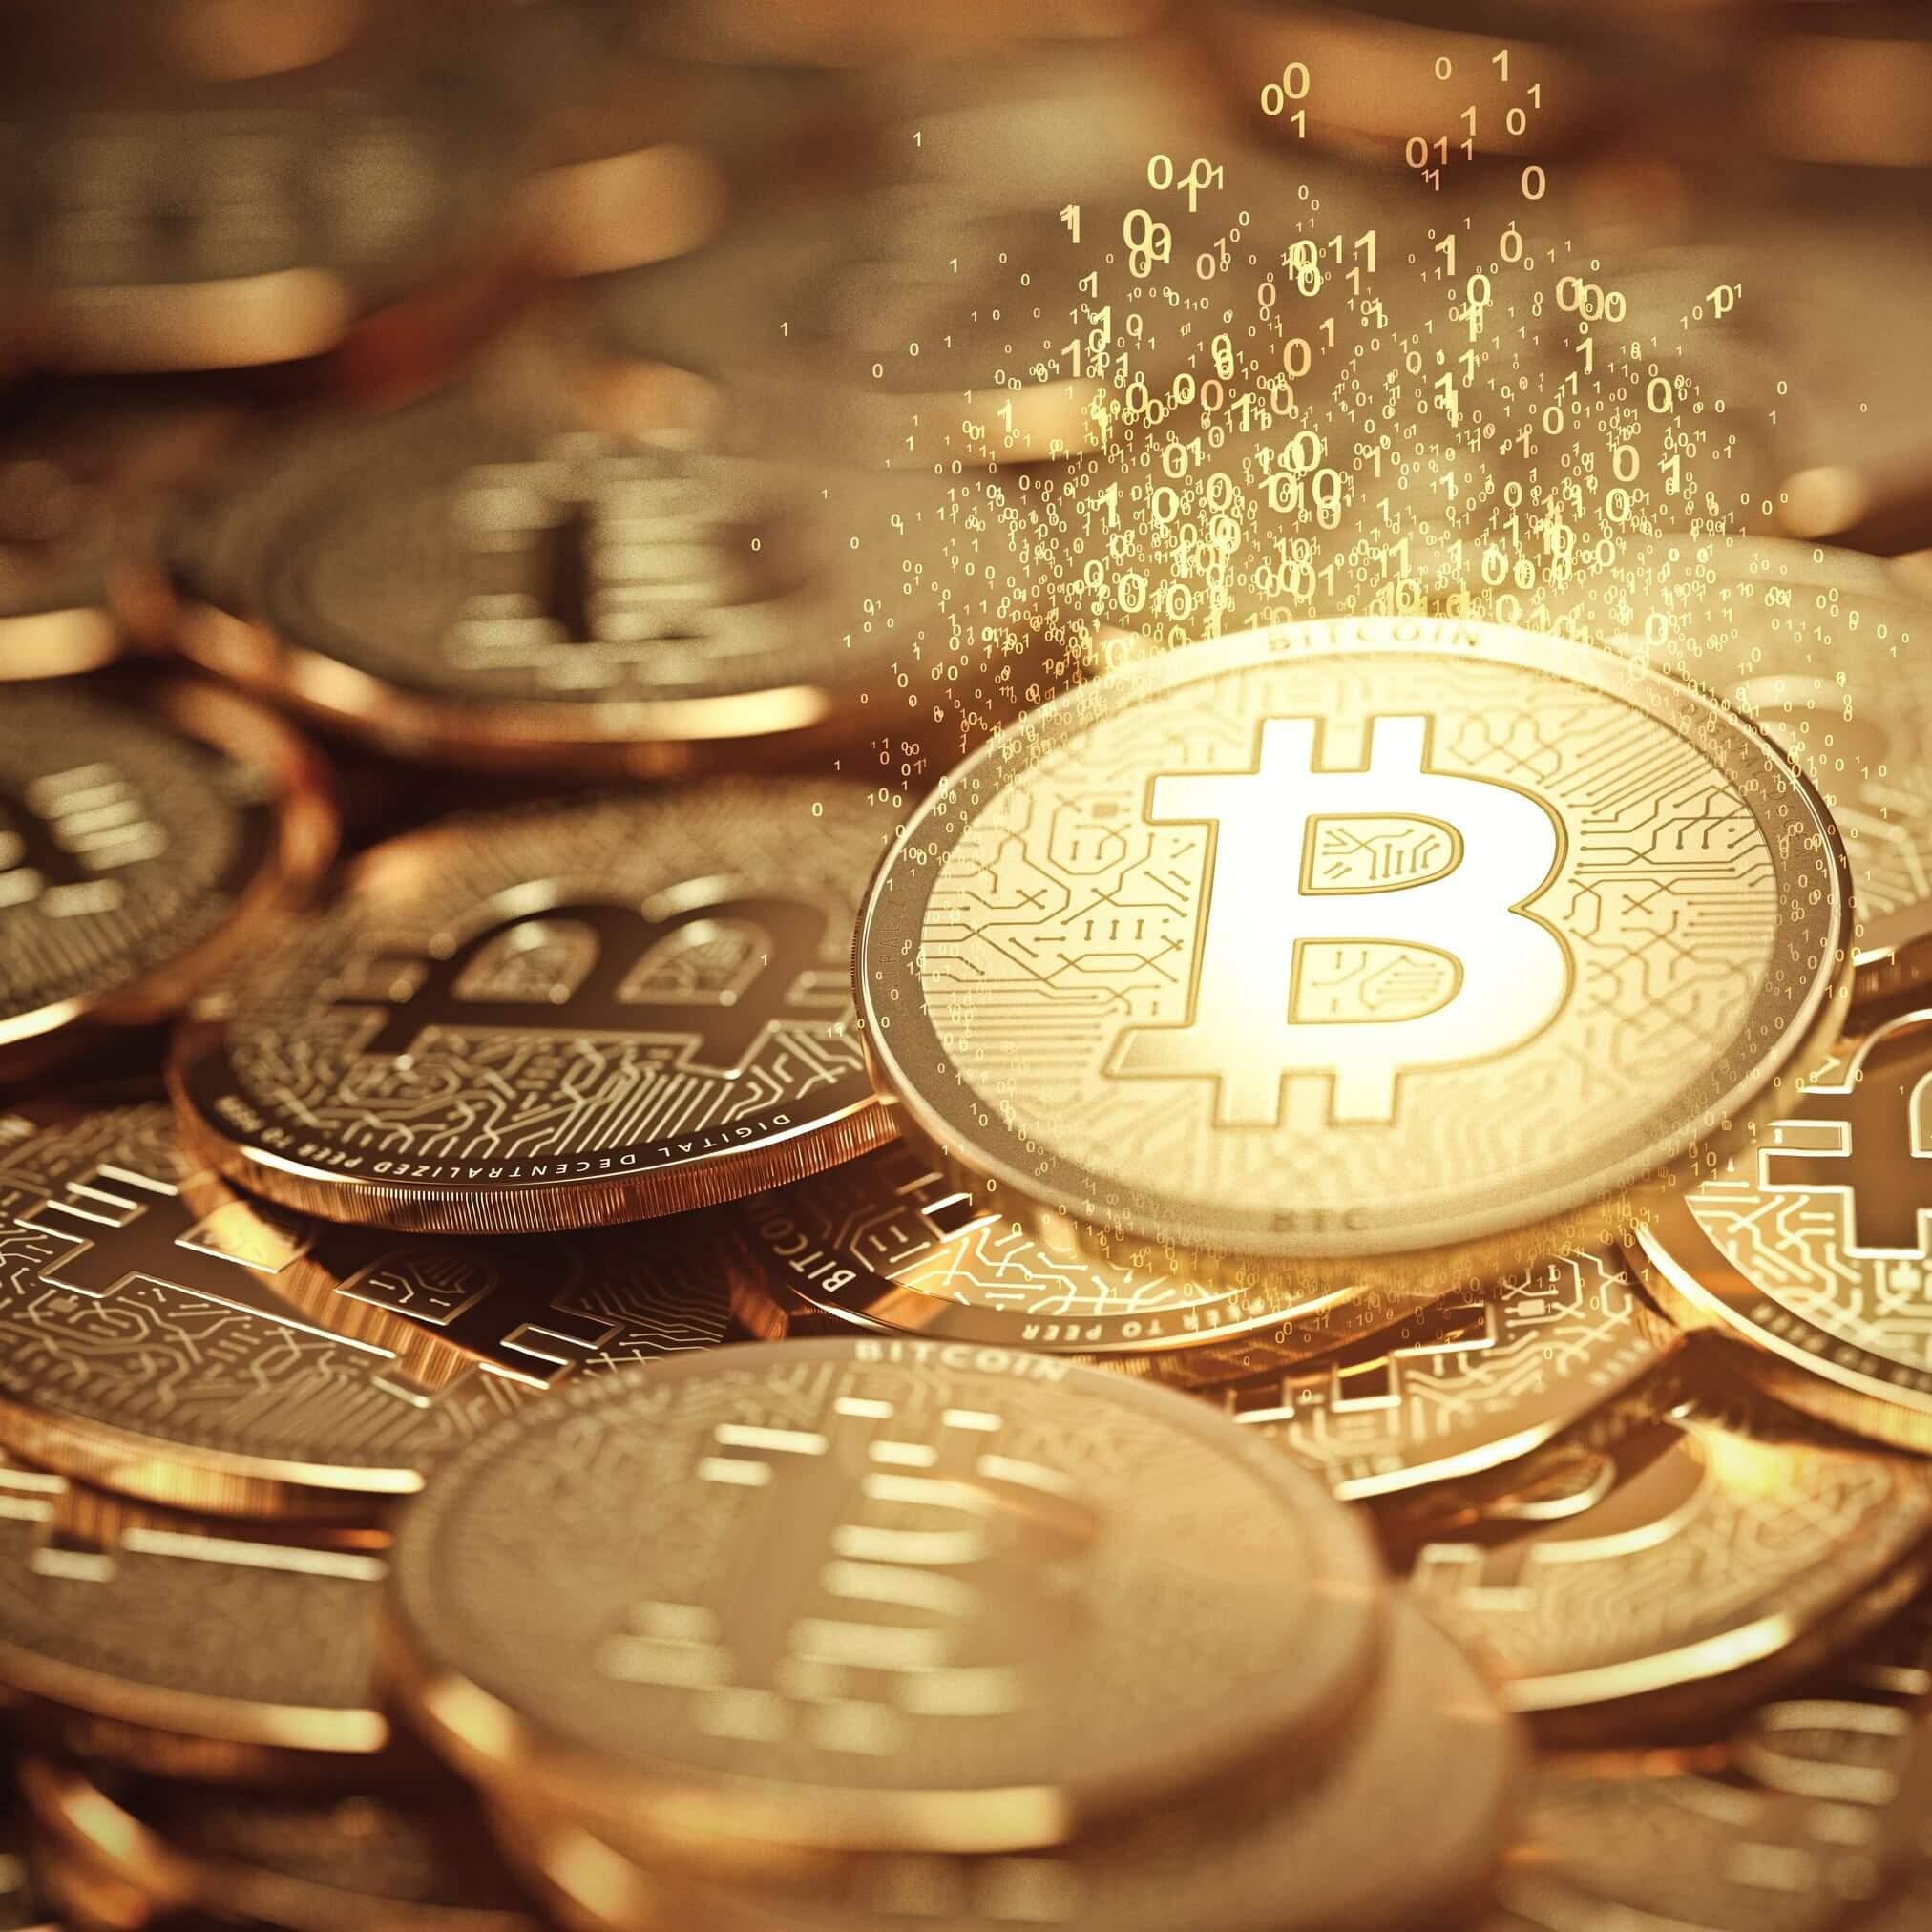 Can bitcoin cash bounce back?